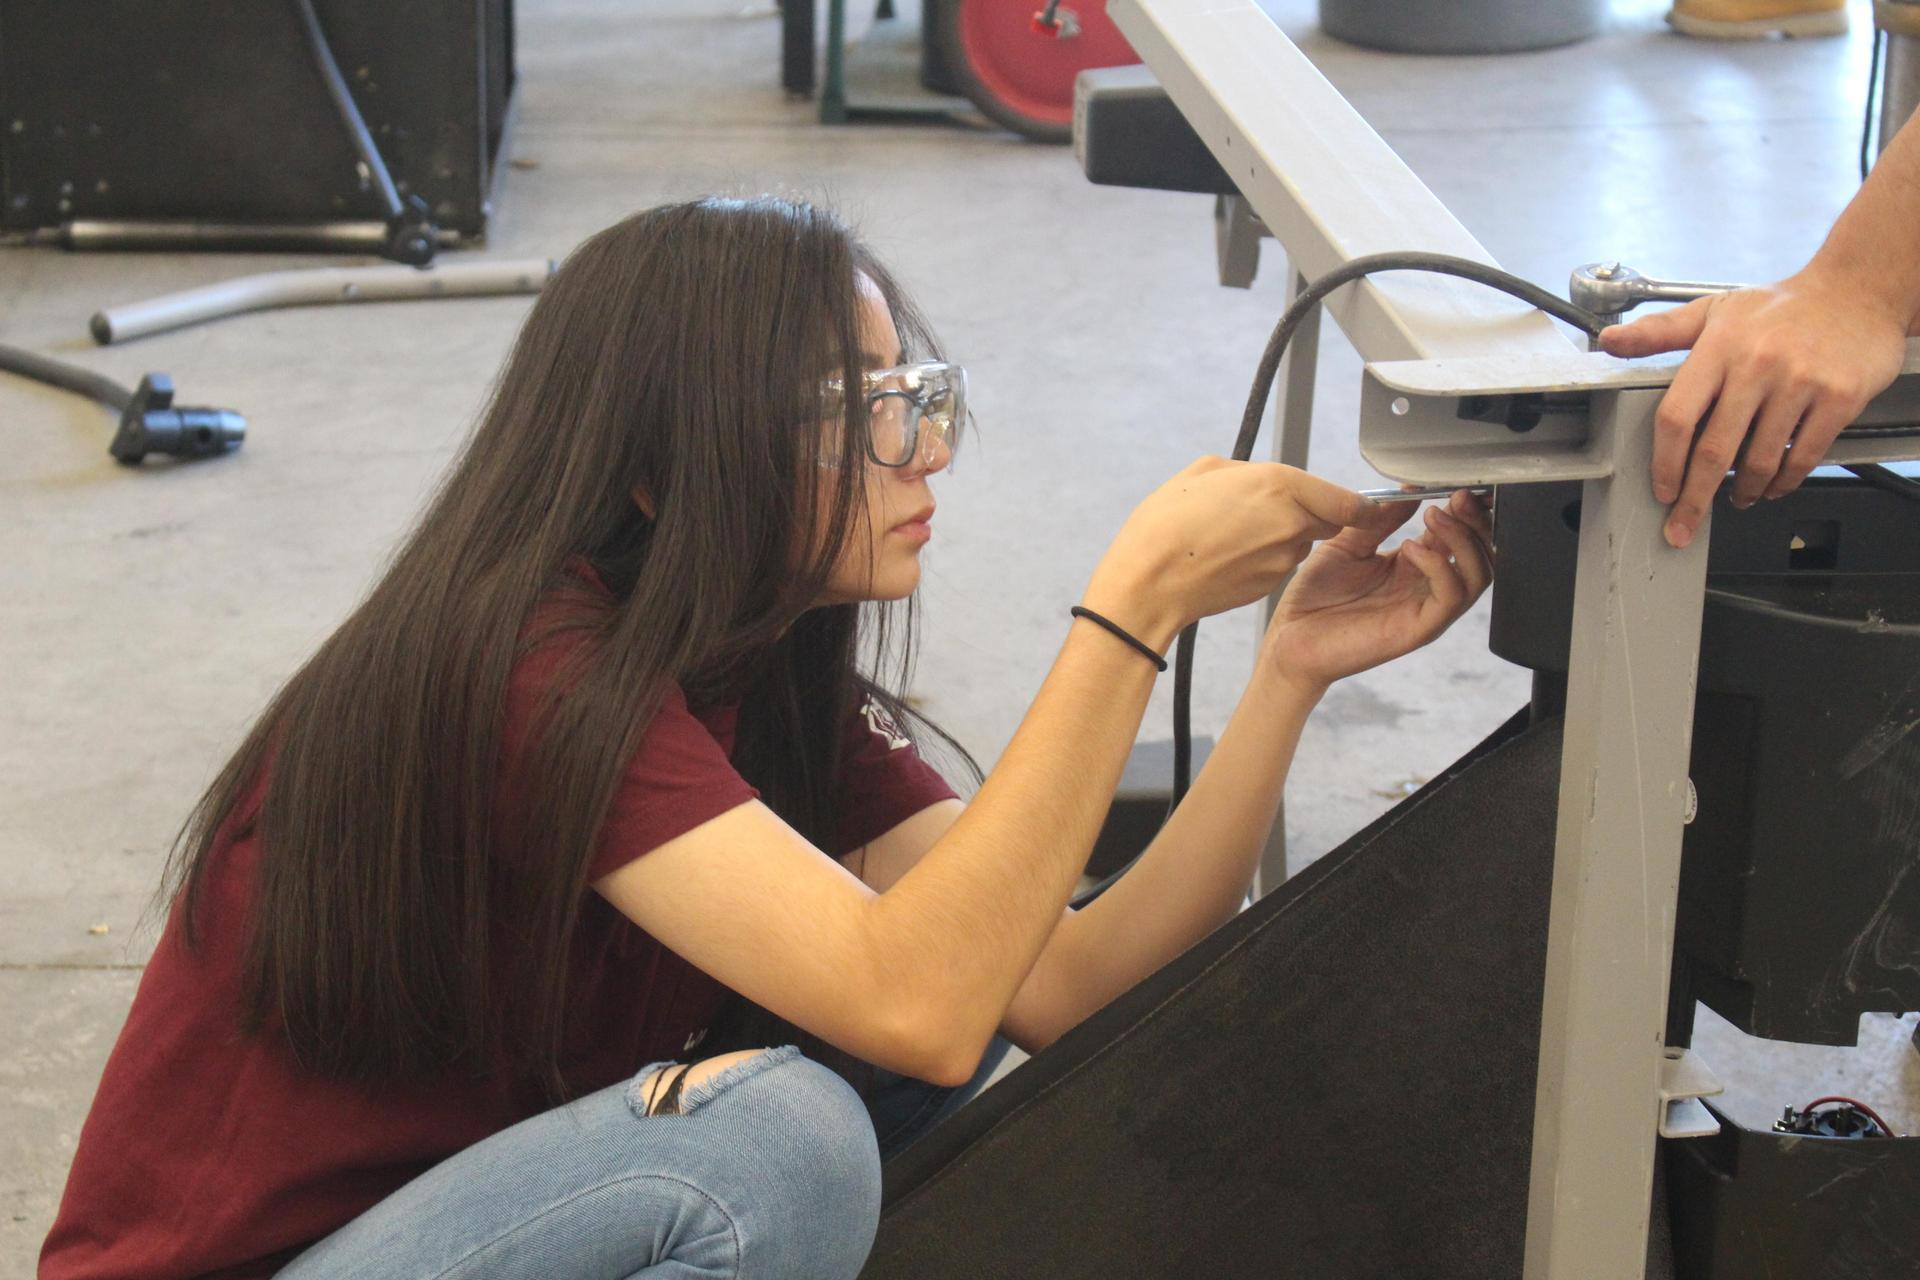 Female student helping put together a hoist